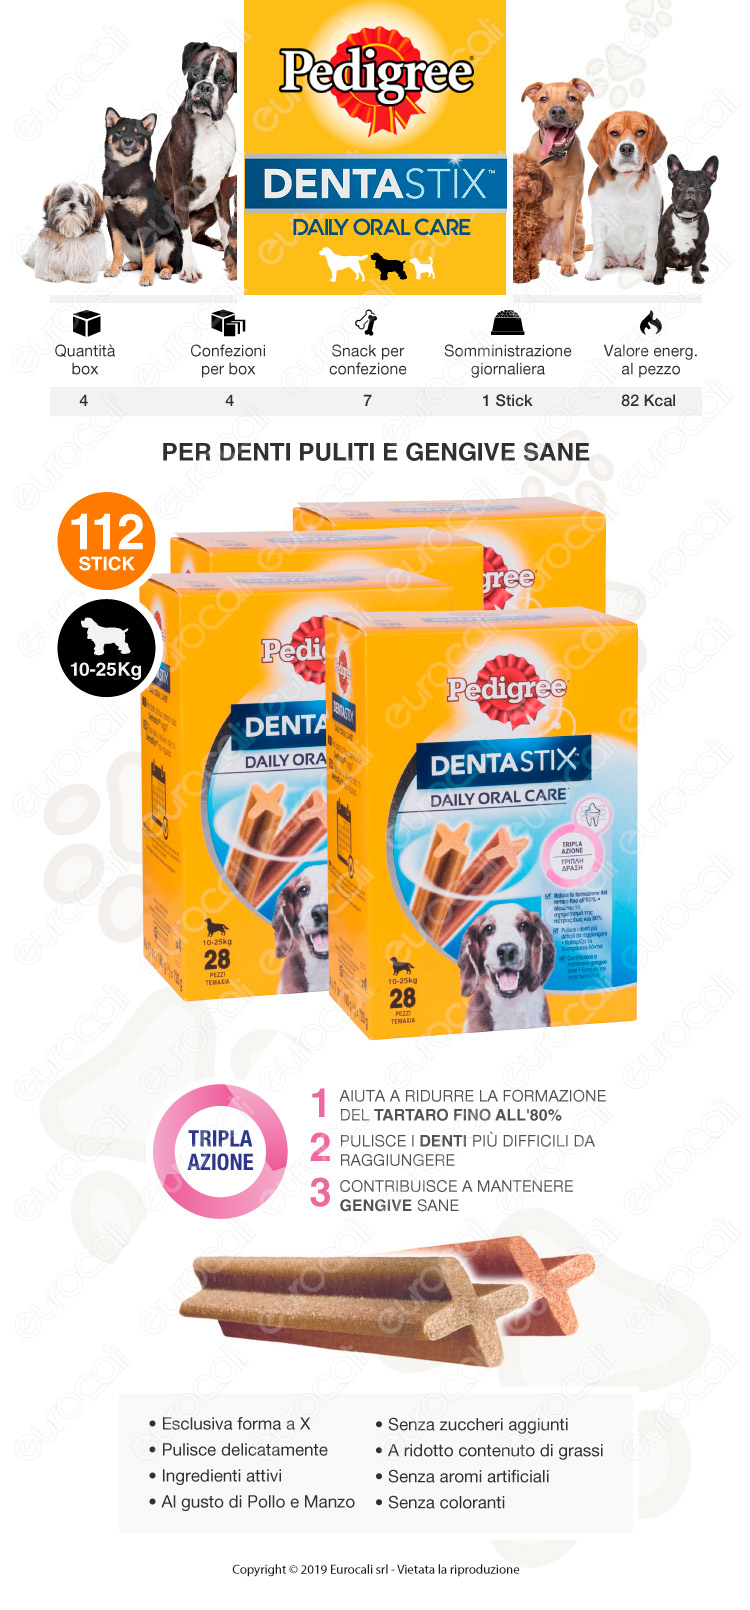 Pedigree Dentastix Medium per l'igiene orale del cane - 4 Confezioni da 28 Stick